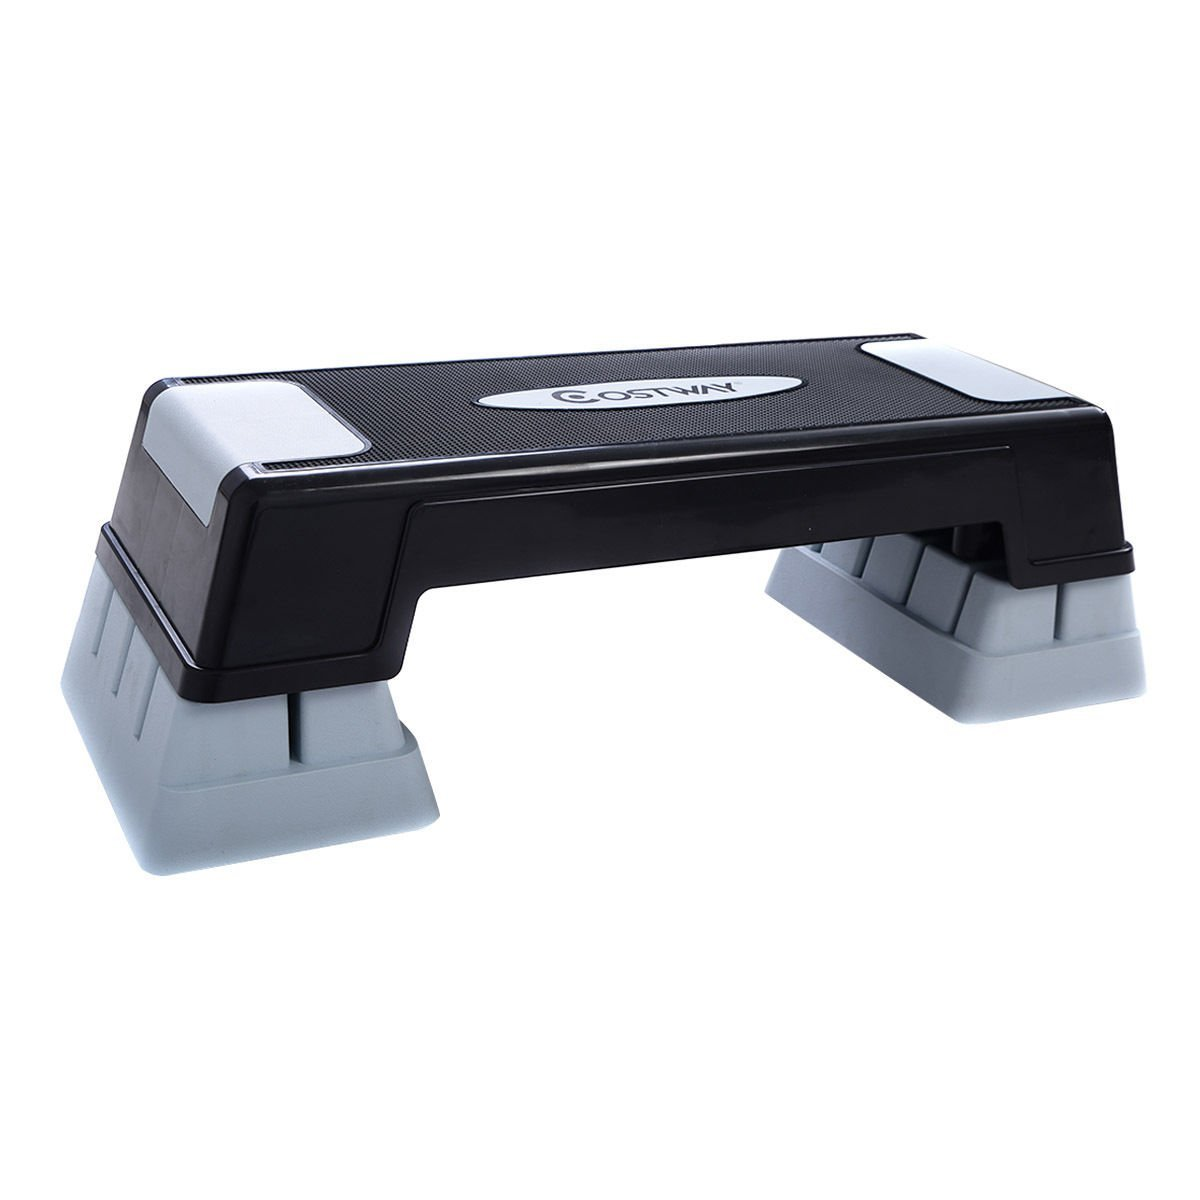 "Giantex 29"" Aerobic Exercise Stepper Platform Adjust 5'' - 7'' - 9'' Fitness Step w/Risers"